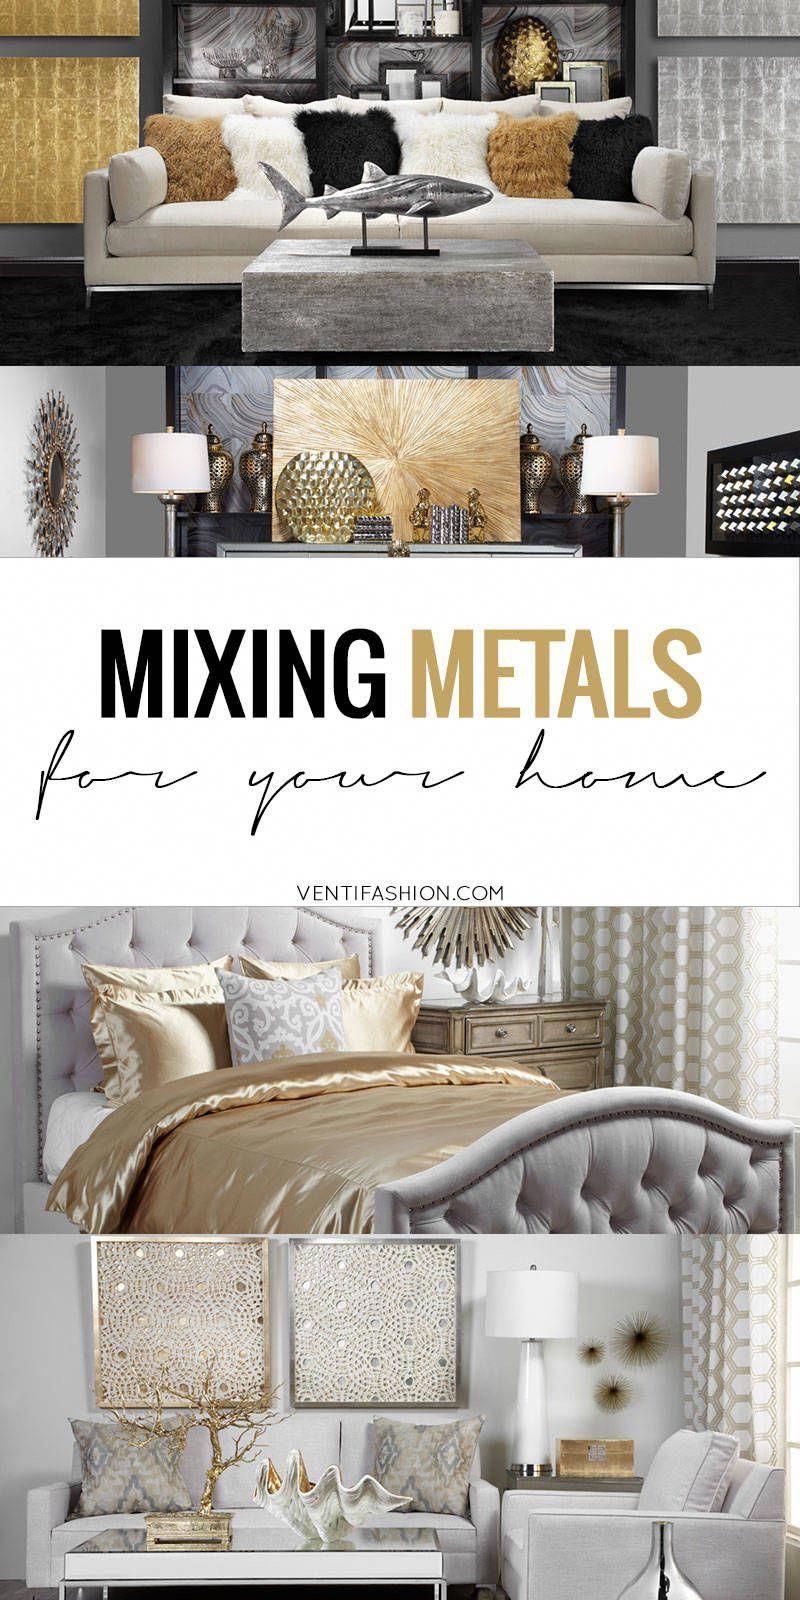 Inspiration Home Decor Mixed Metals homedecortips